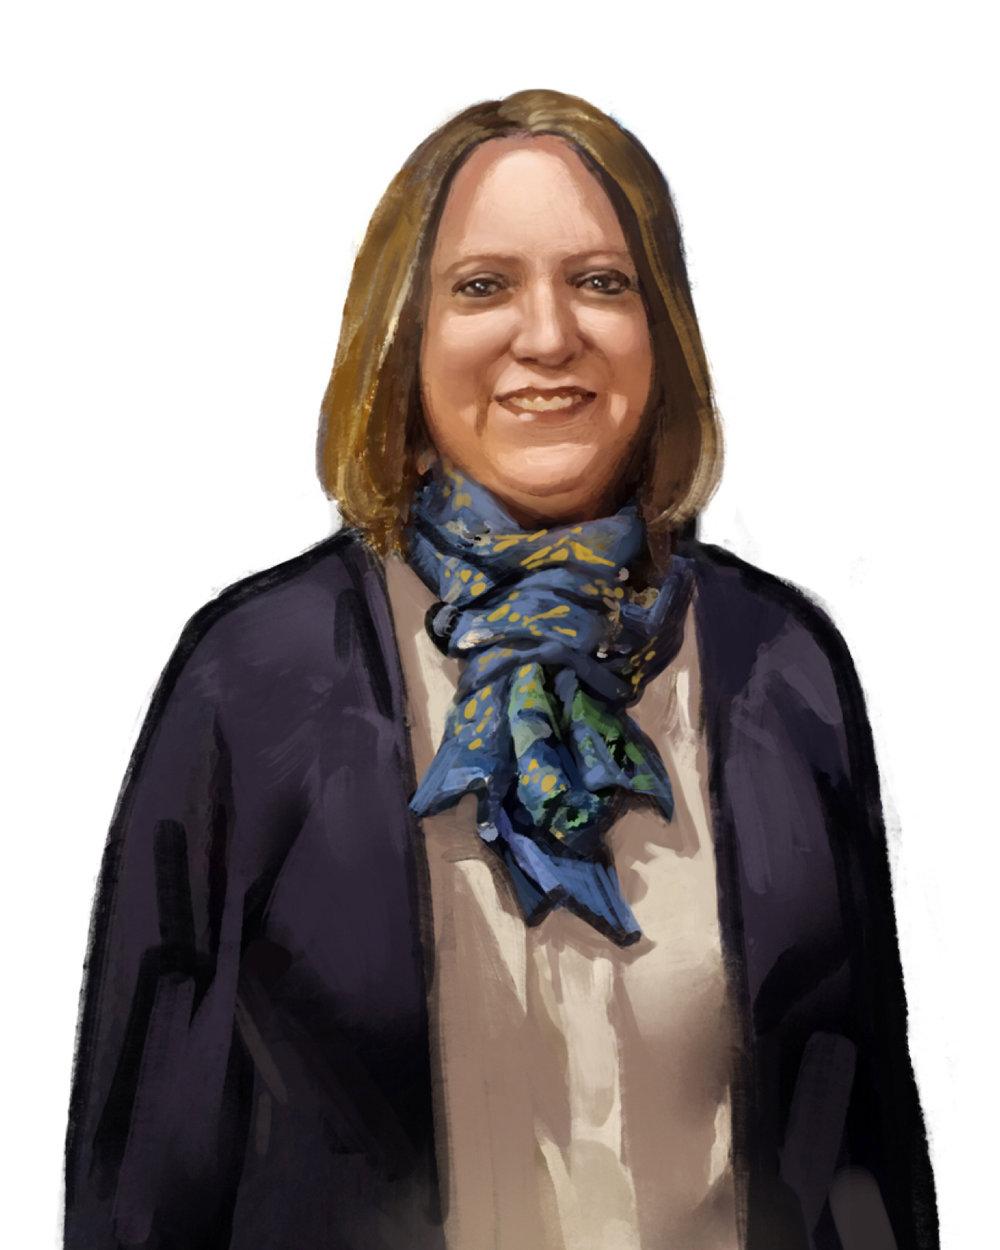 Jenn - Manager, Technical Design and Development